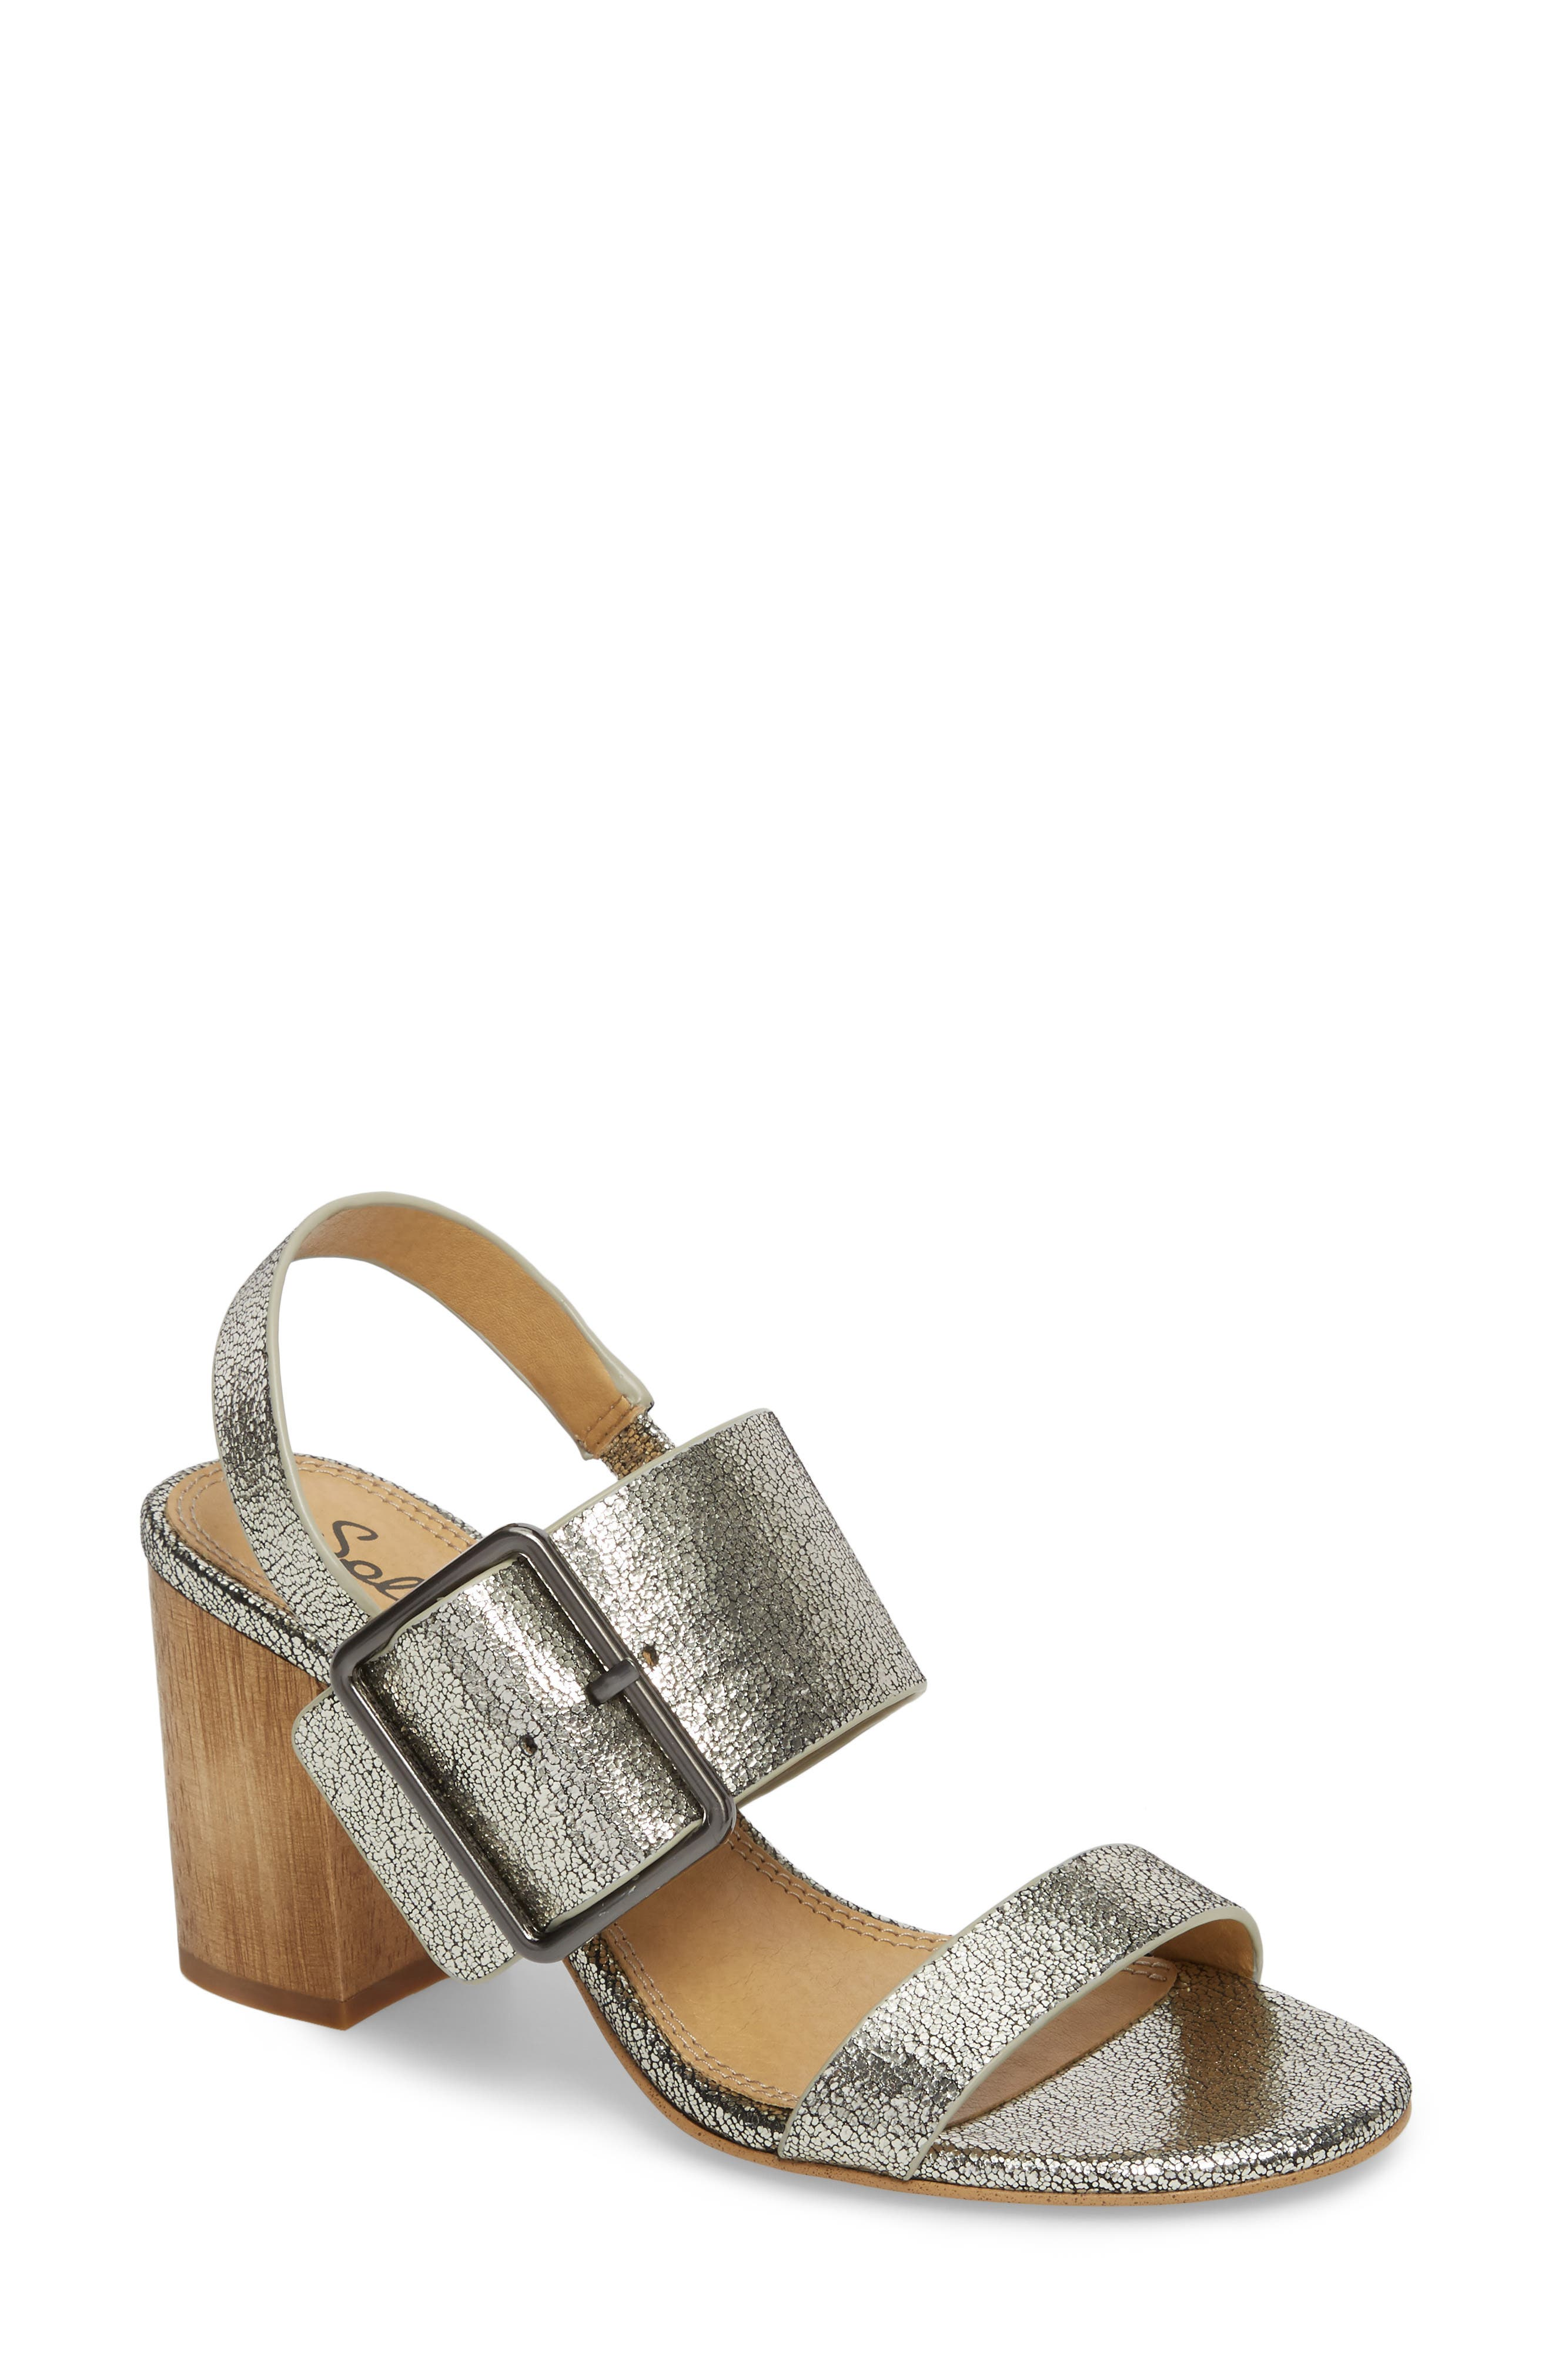 Bo Slingback Sandal,                             Main thumbnail 1, color,                             Nickel Metallic Leather